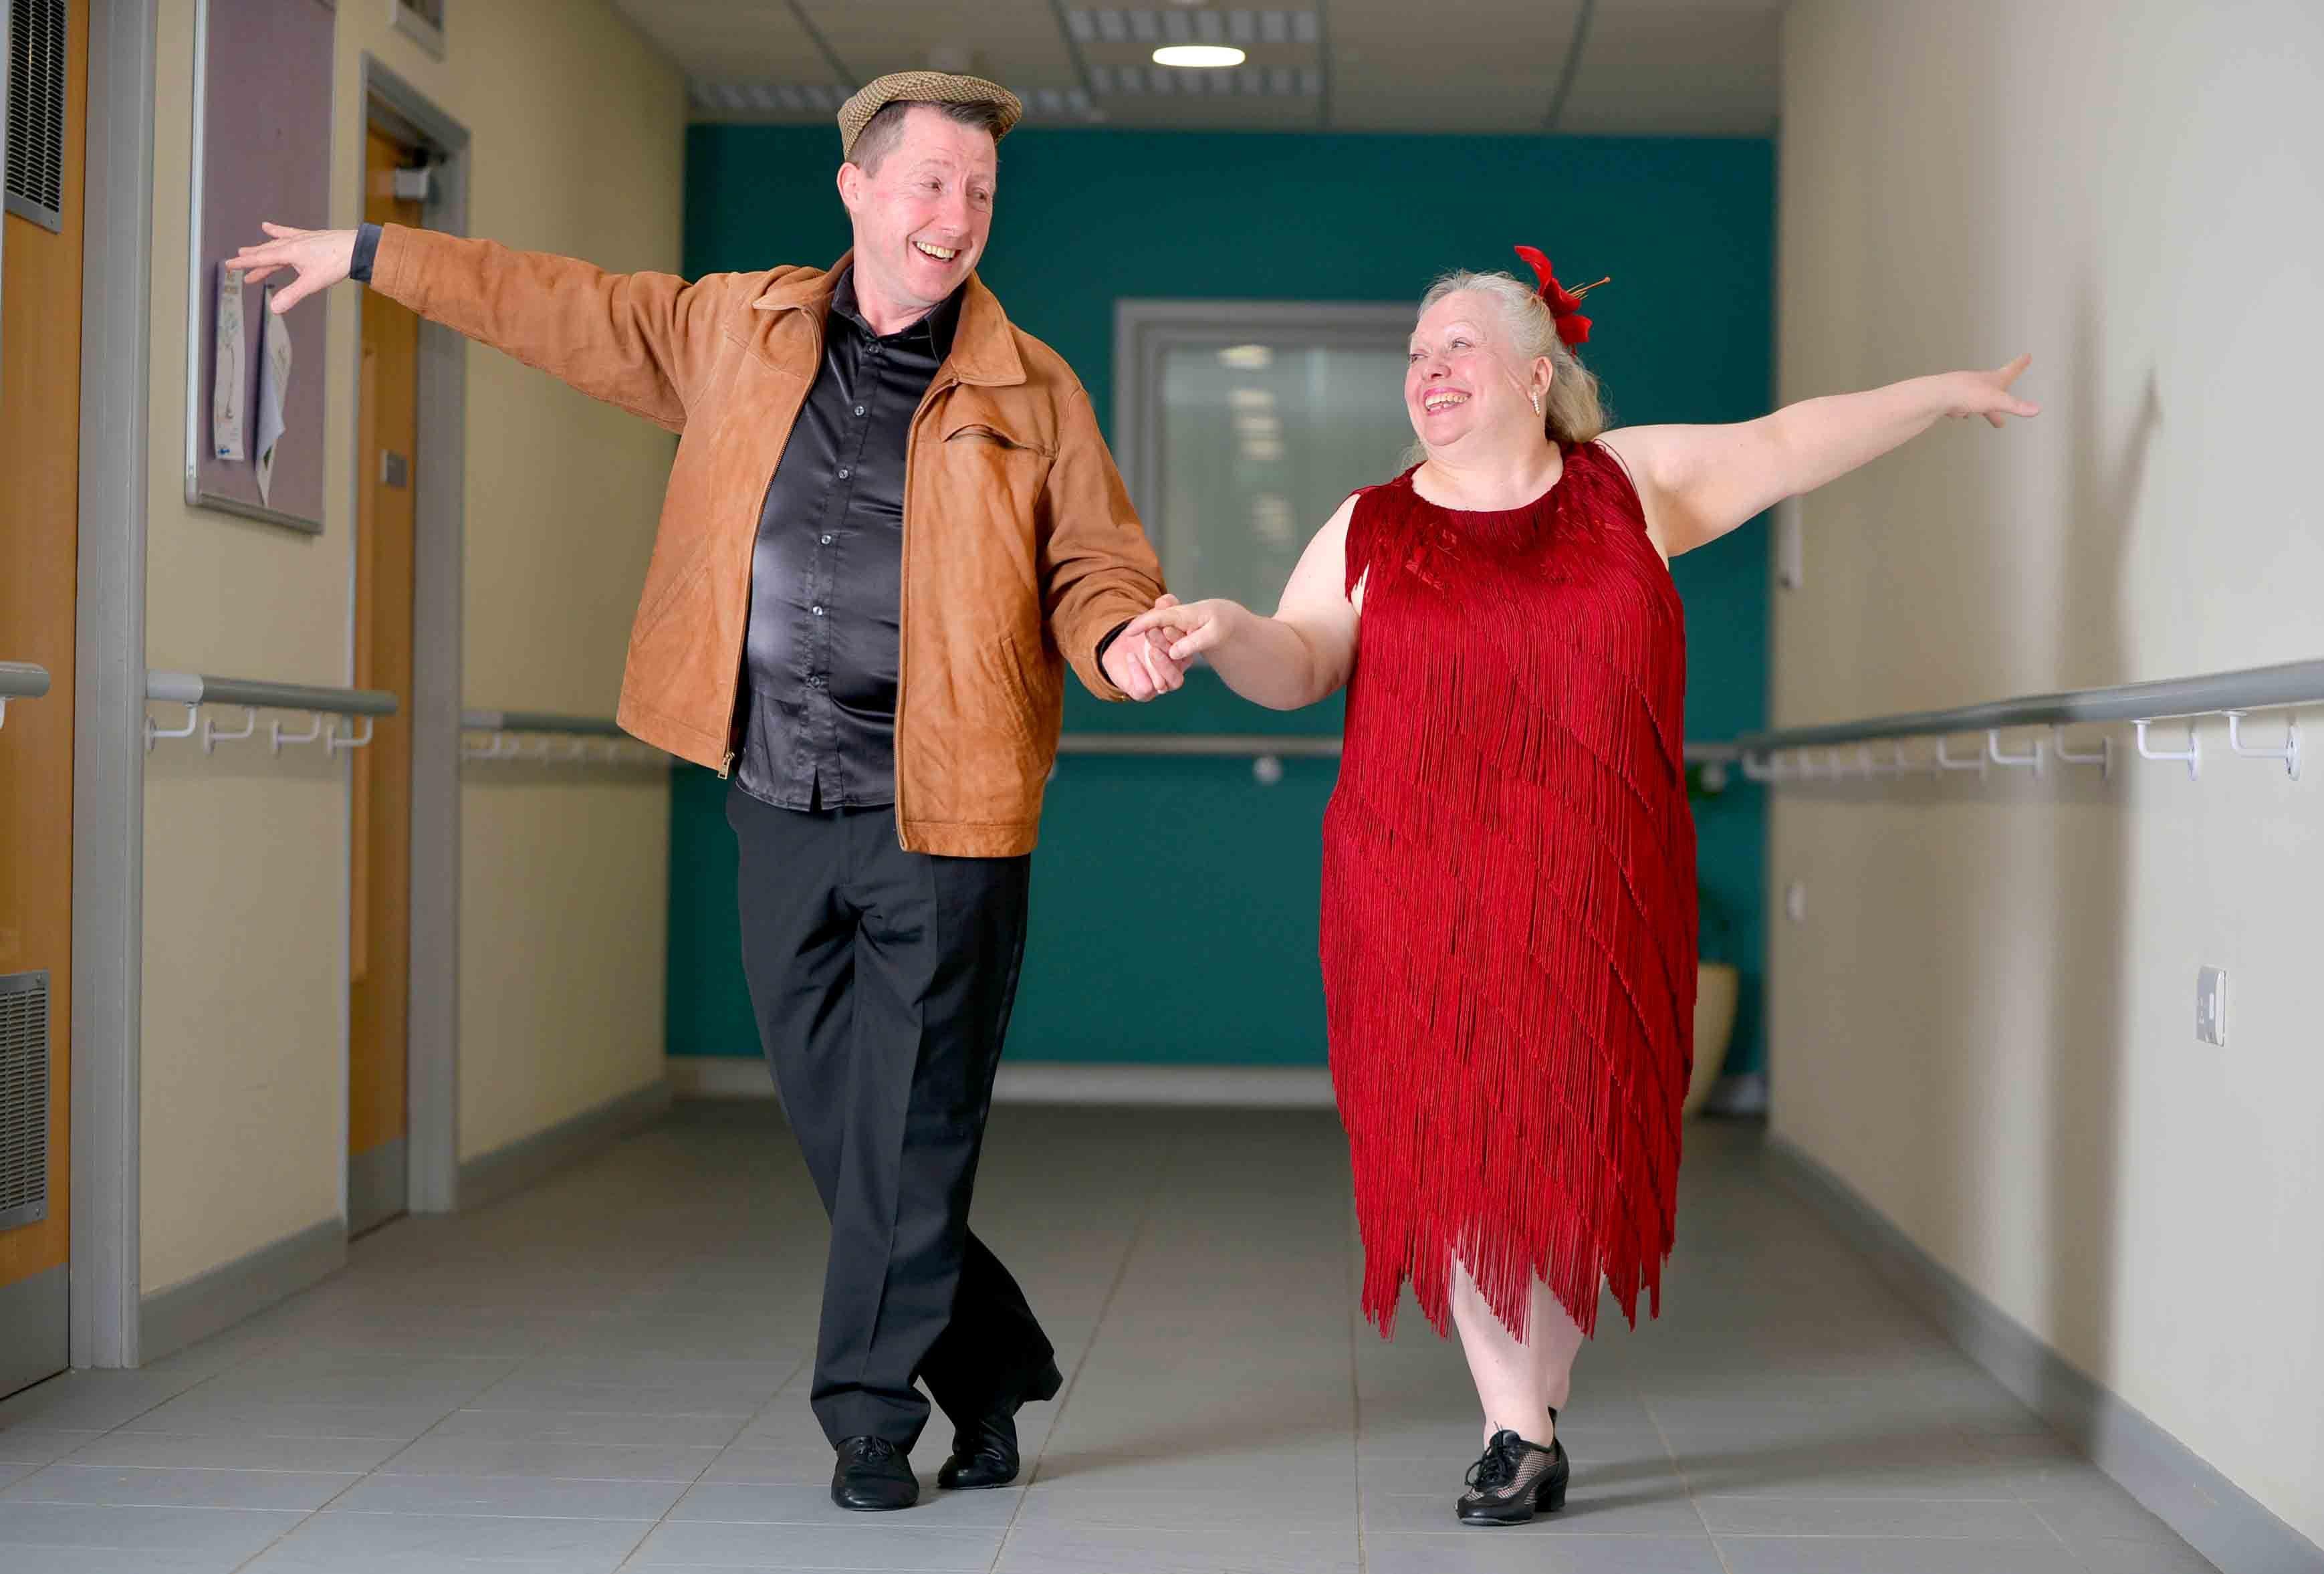 Dancing Wolverhampton grandparents going for BGT glory